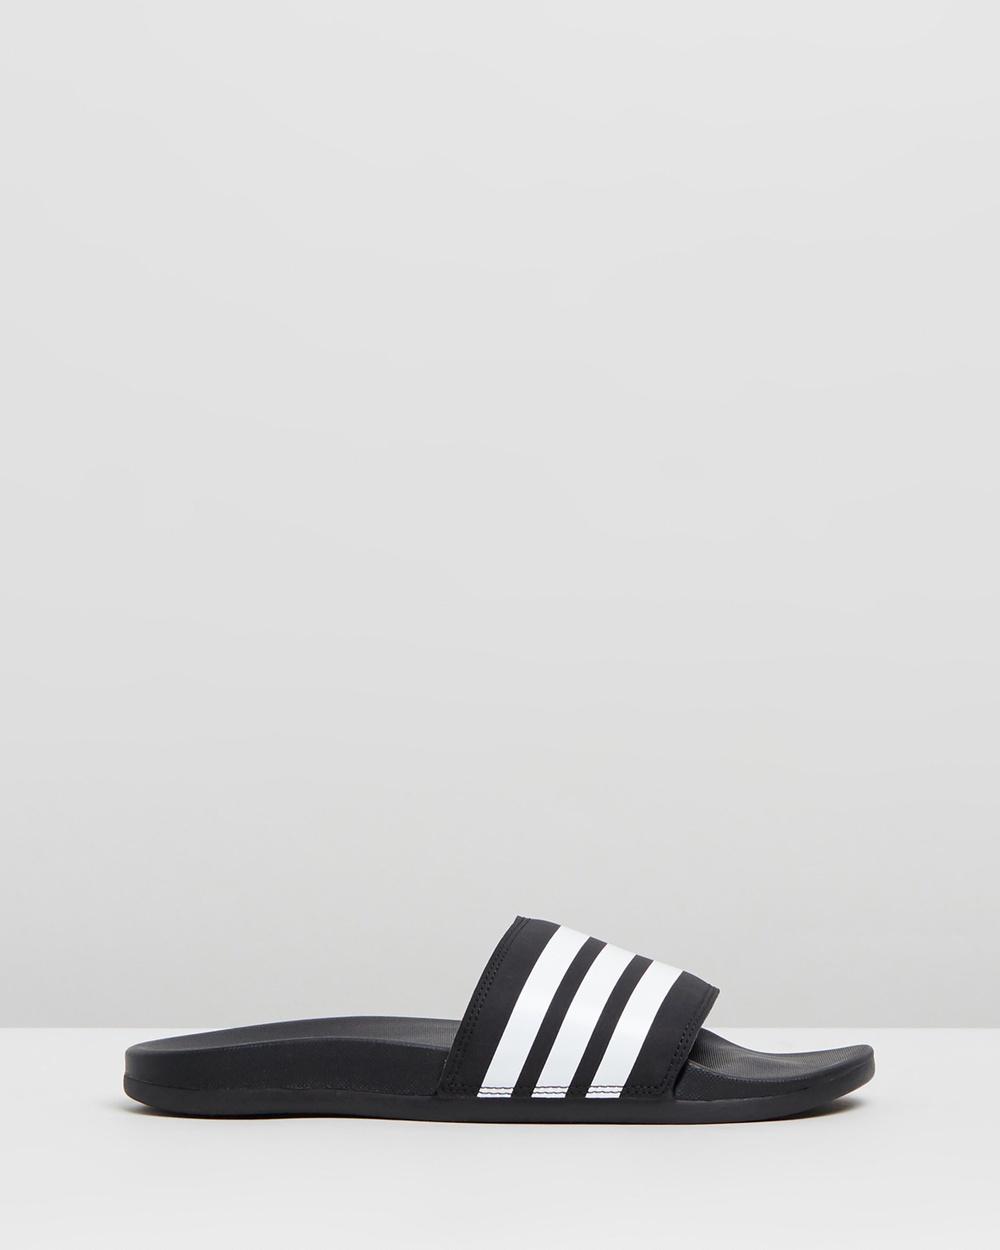 adidas Performance Adilette Comfort Slides Women's Sandals Core Black & White